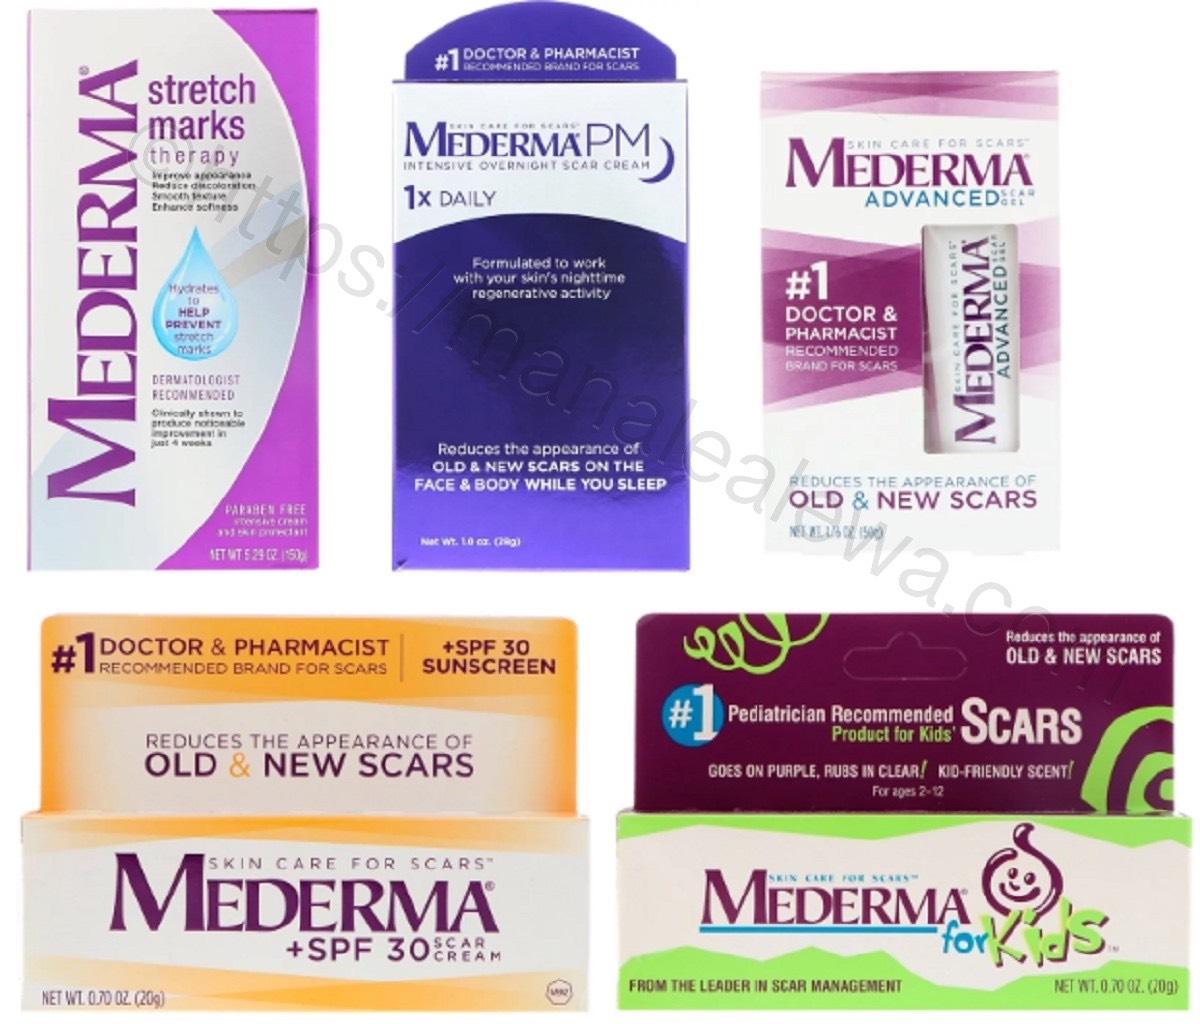 mederma-product-image